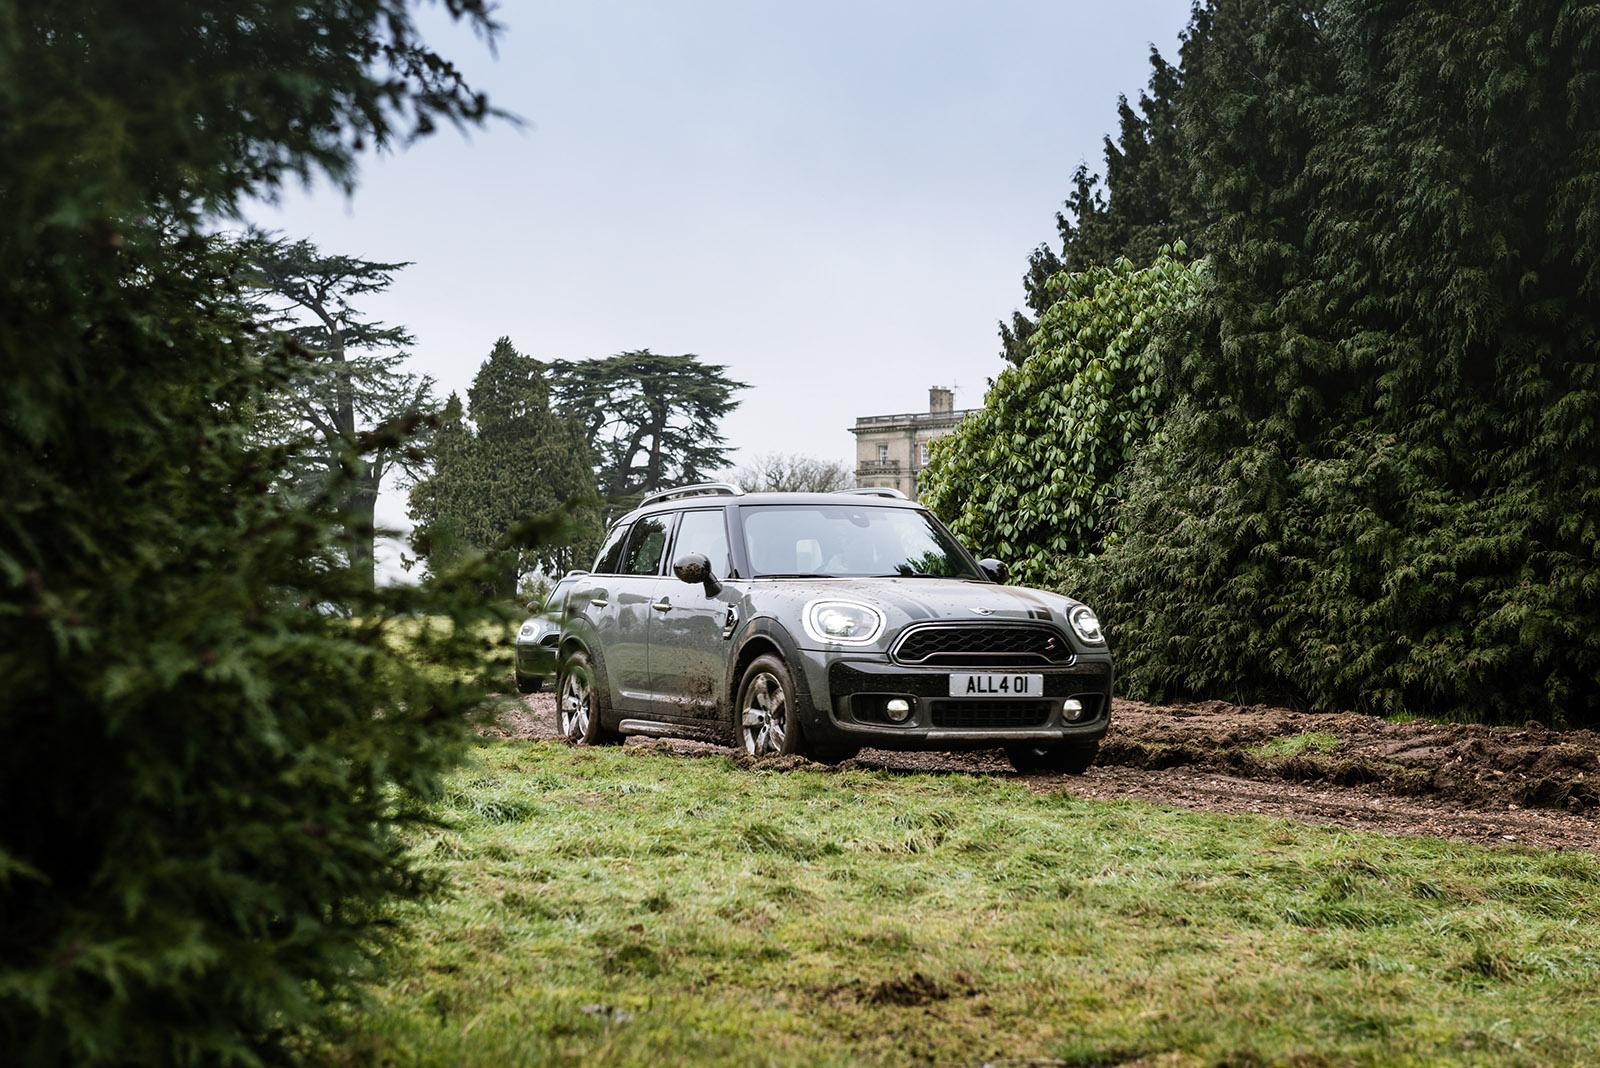 Picknick in Oxfordshire: Unterwegs mit dem neuen MINI Countryman 6